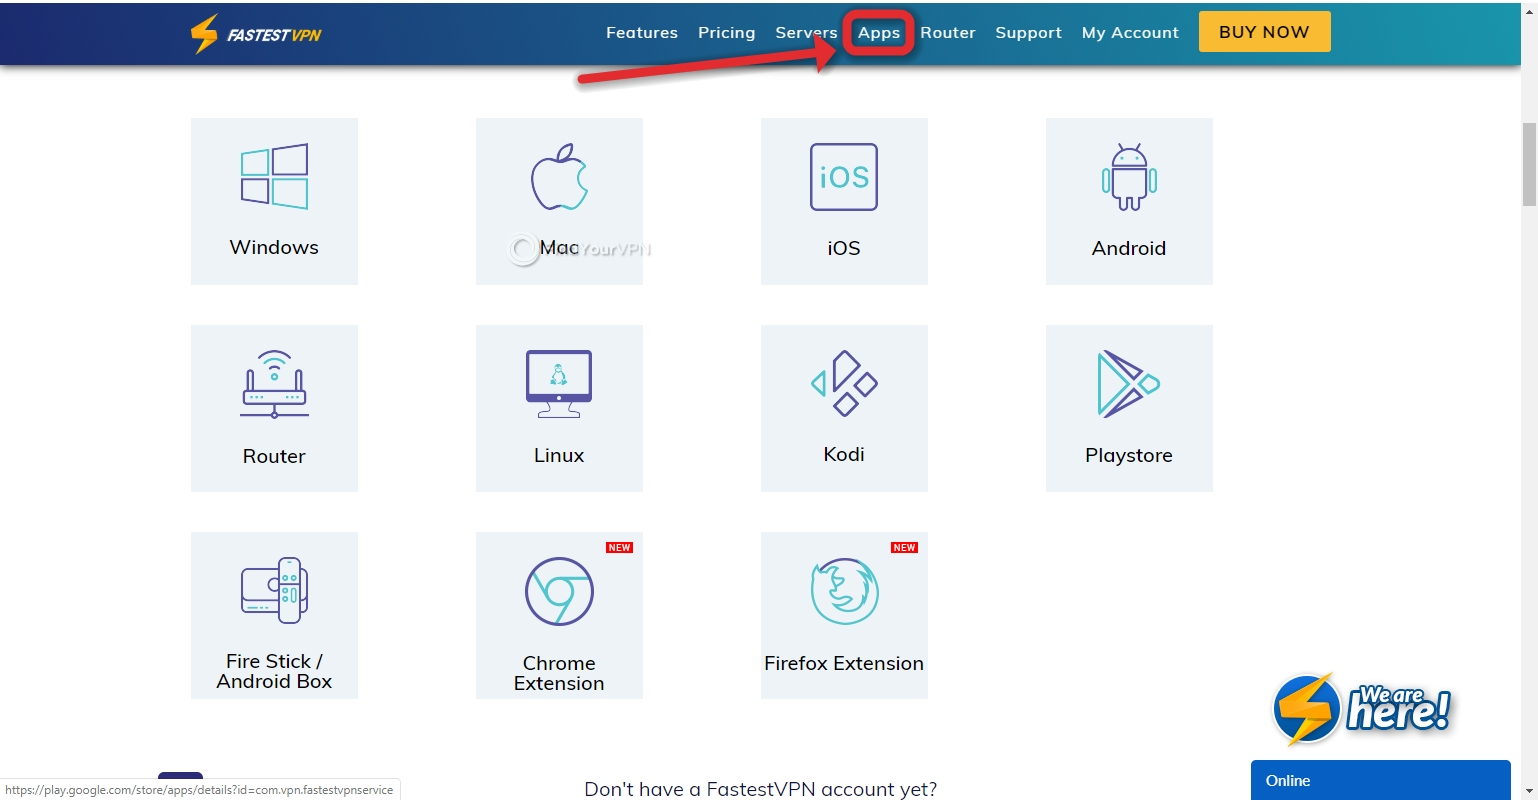 How to download FastestVPN